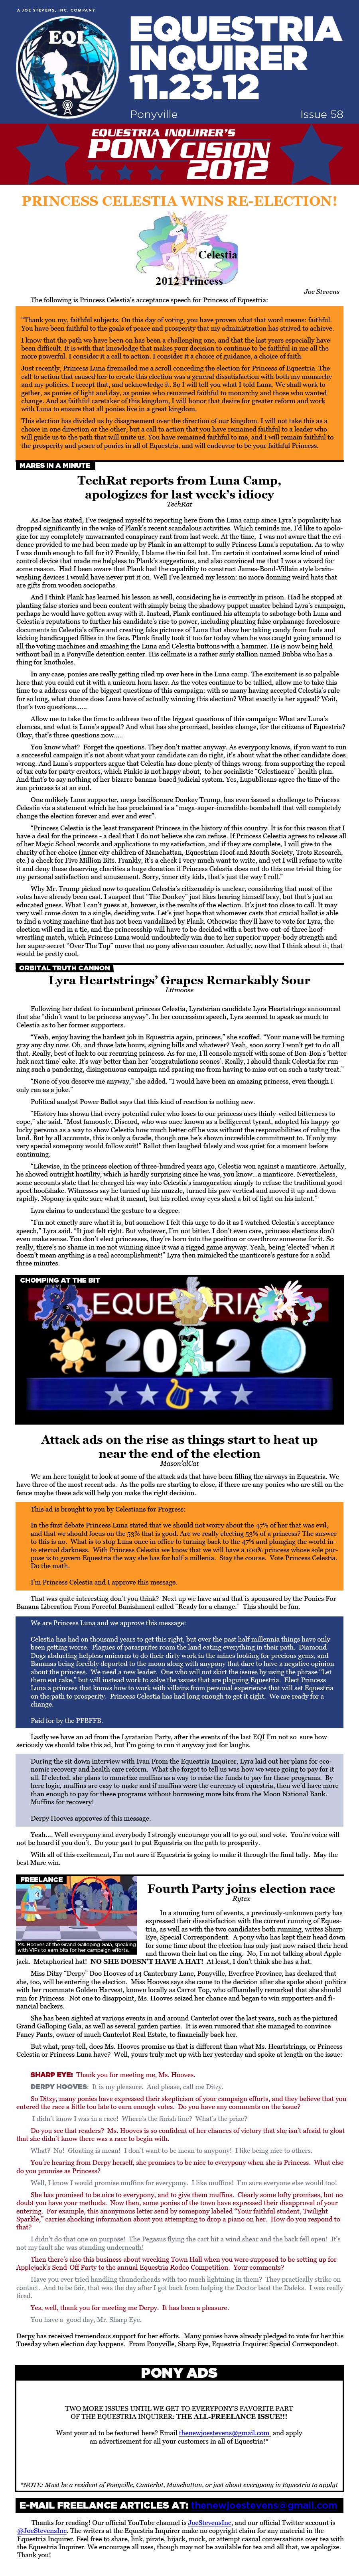 Equestria Inquirer 58 by JoeStevensInc